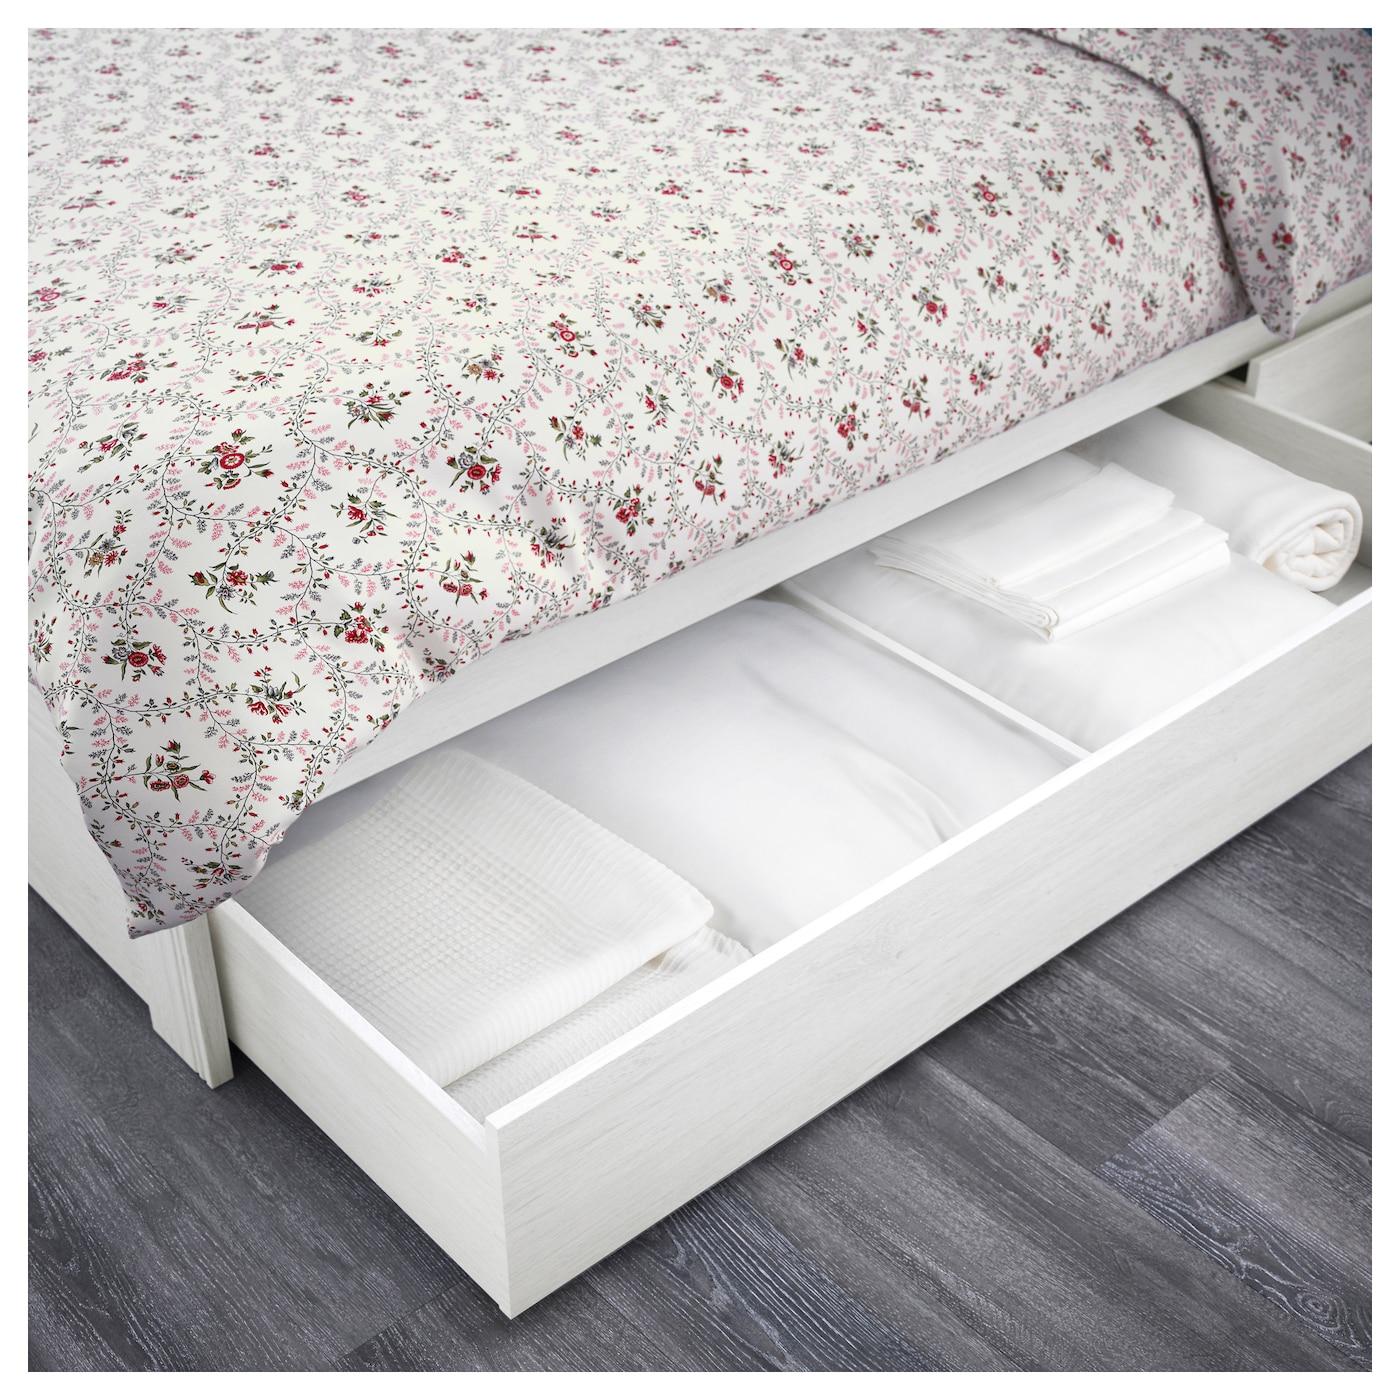 BRUSALI Bed frame with 2 storage boxes Whitelury Standard Double